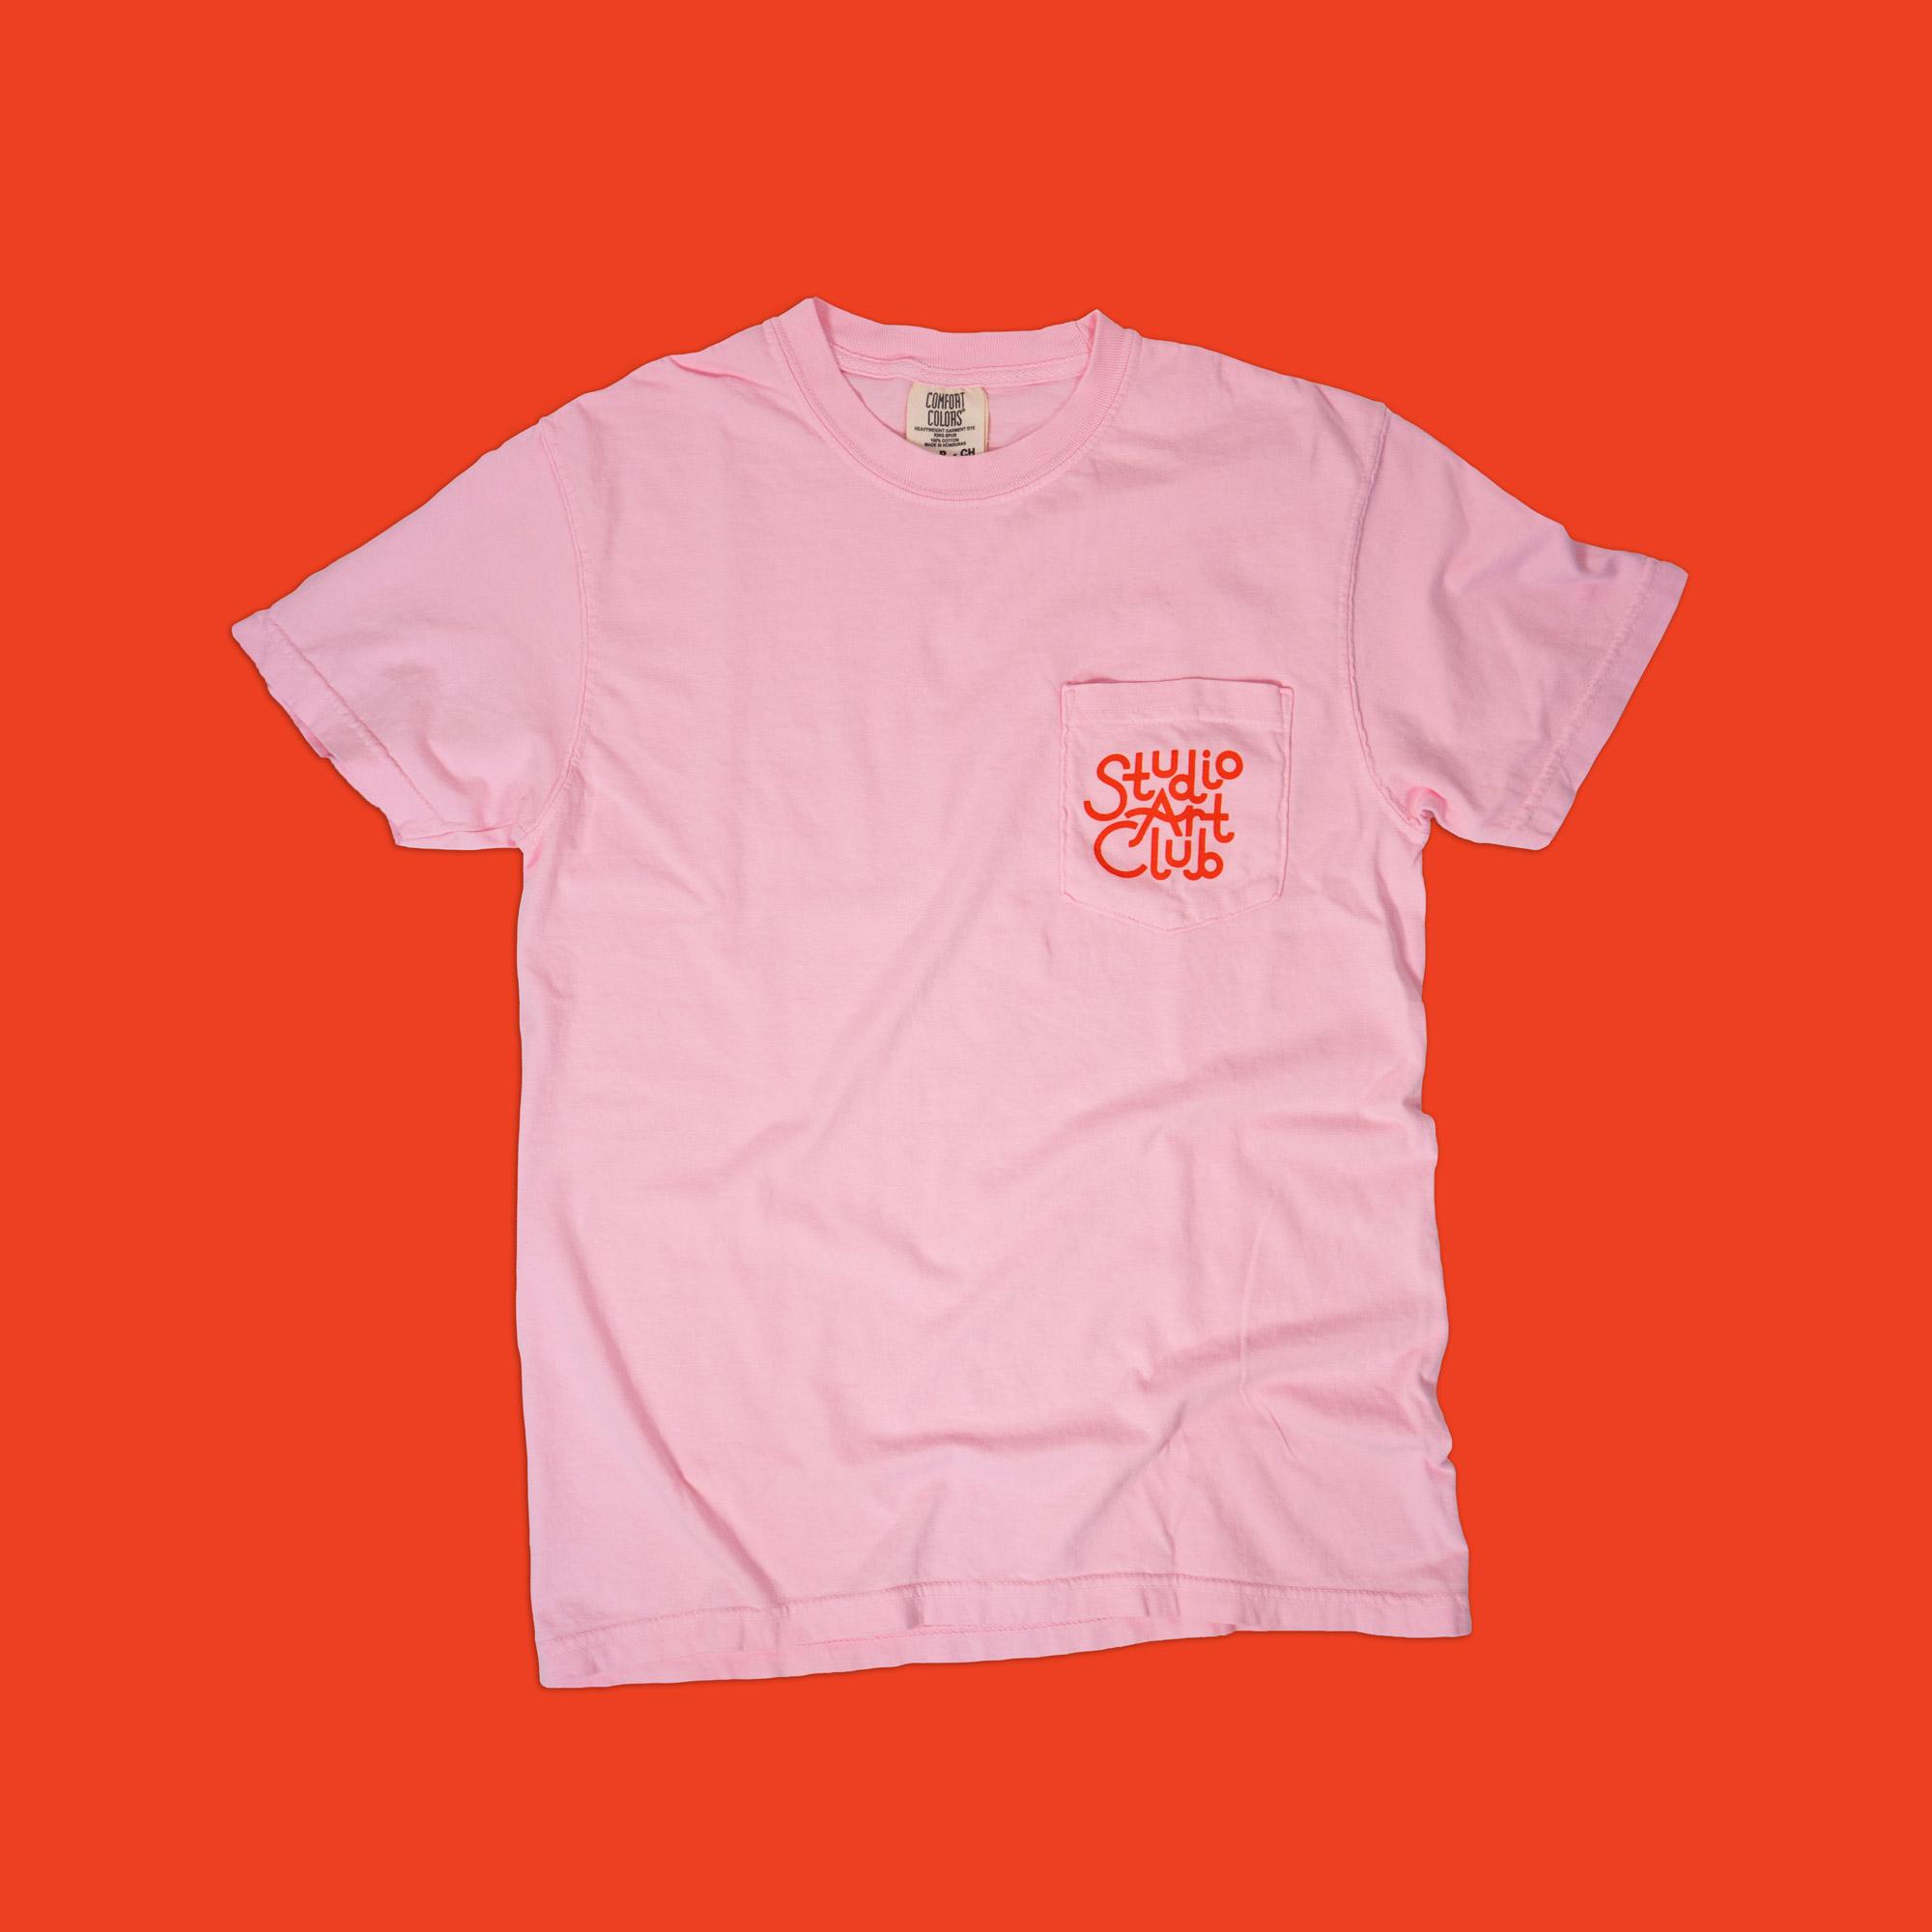 Ocean-and-Sea_Studio-Art-Club_T-Shirt